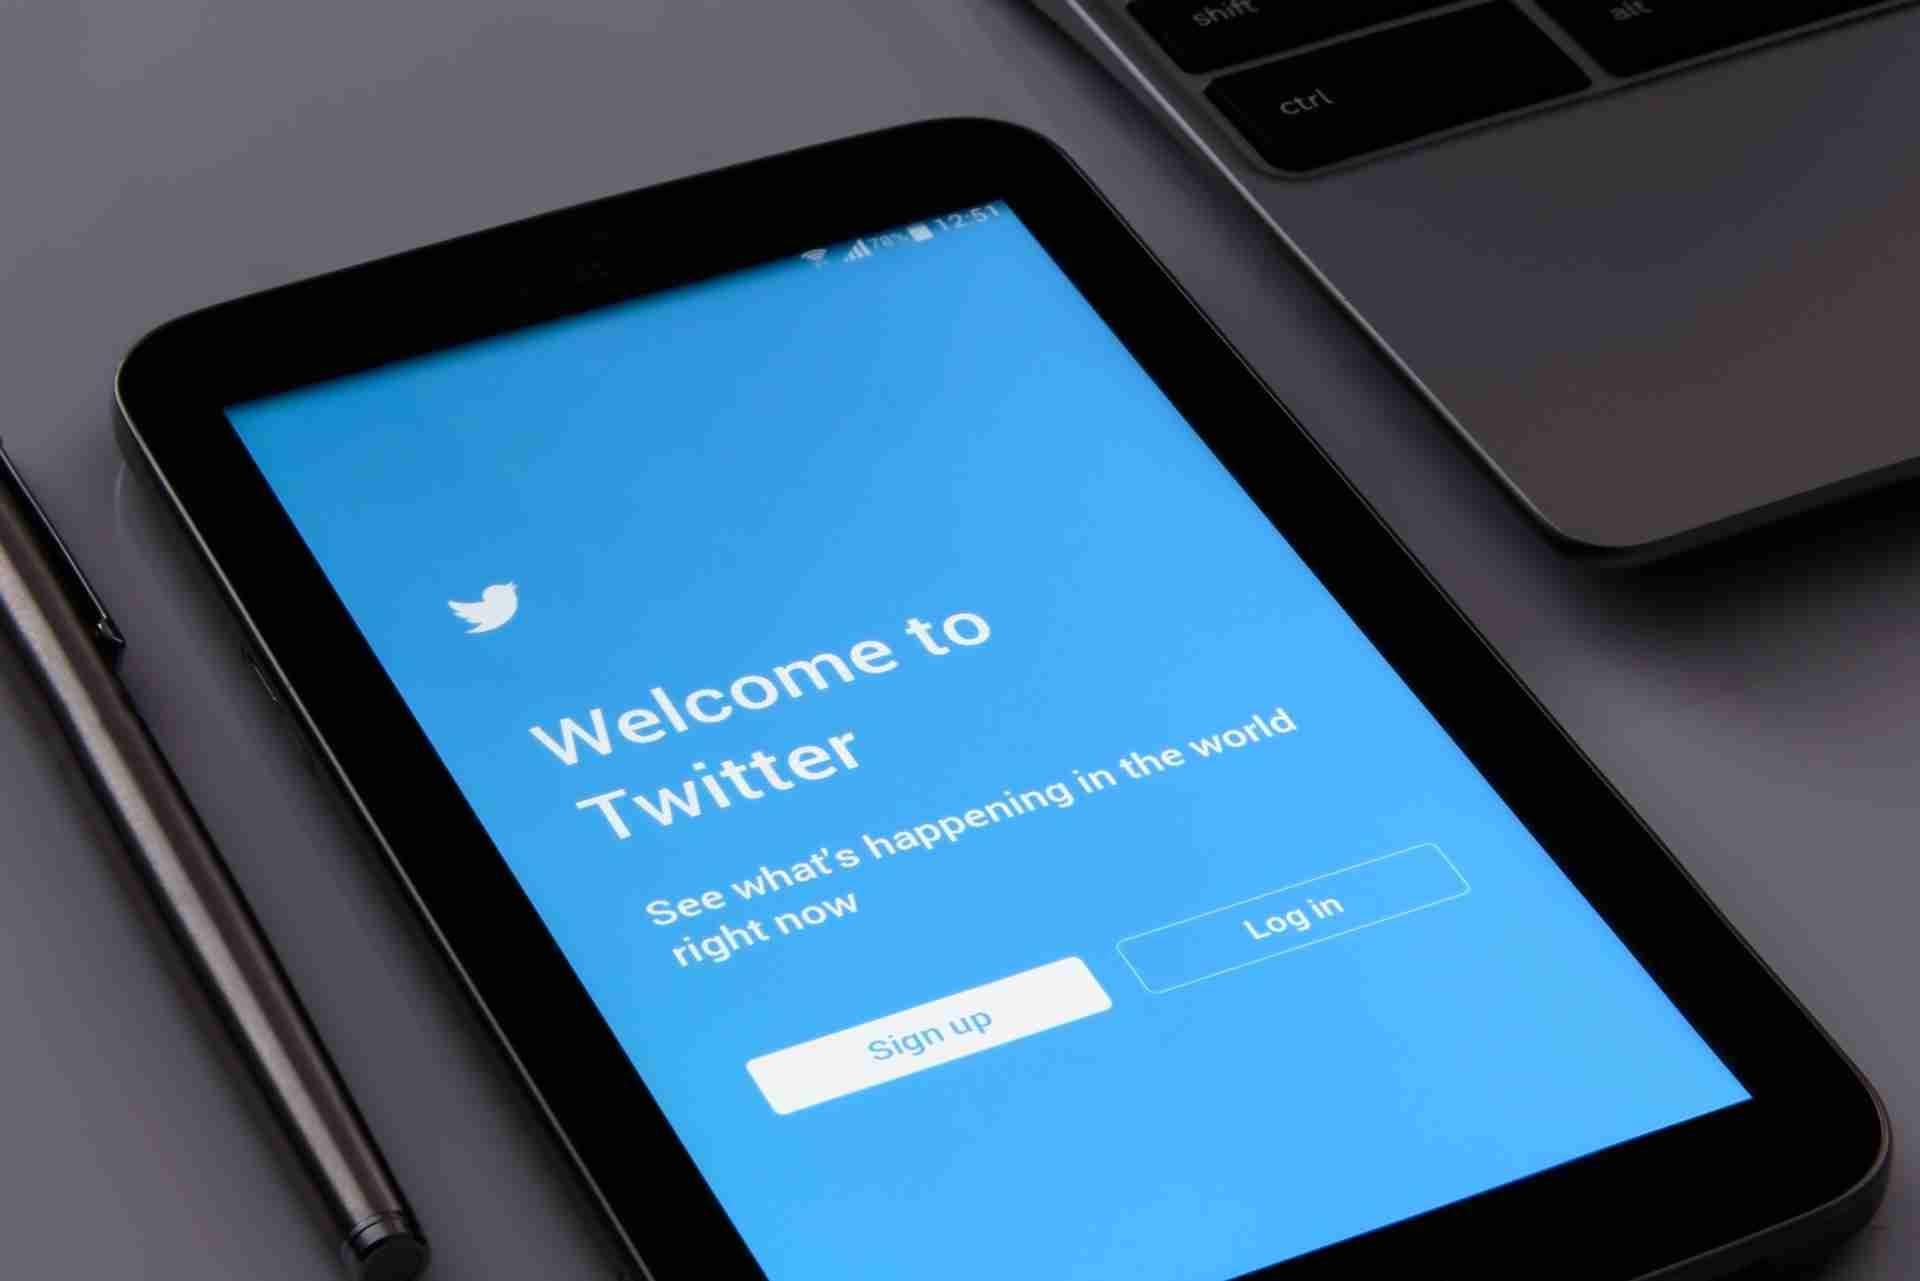 twitter on tablet